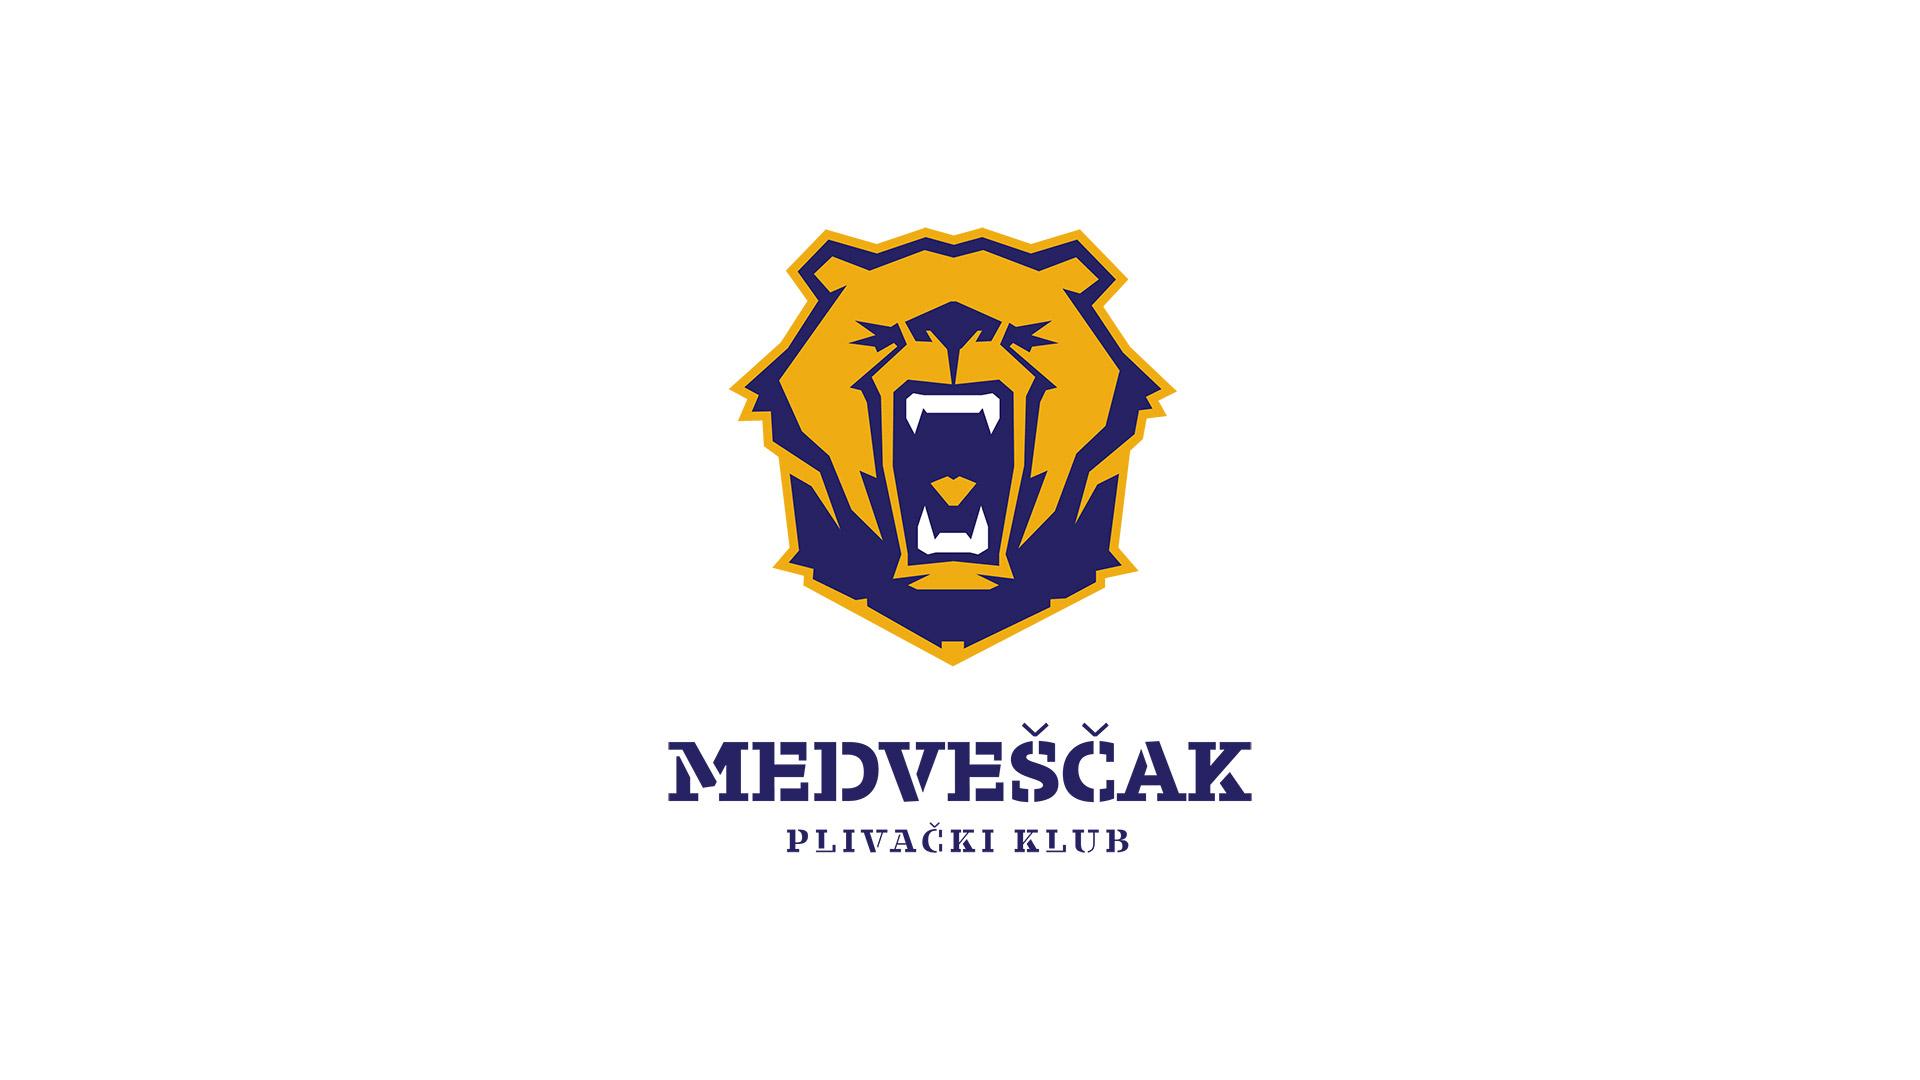 medvescak_pkm-01